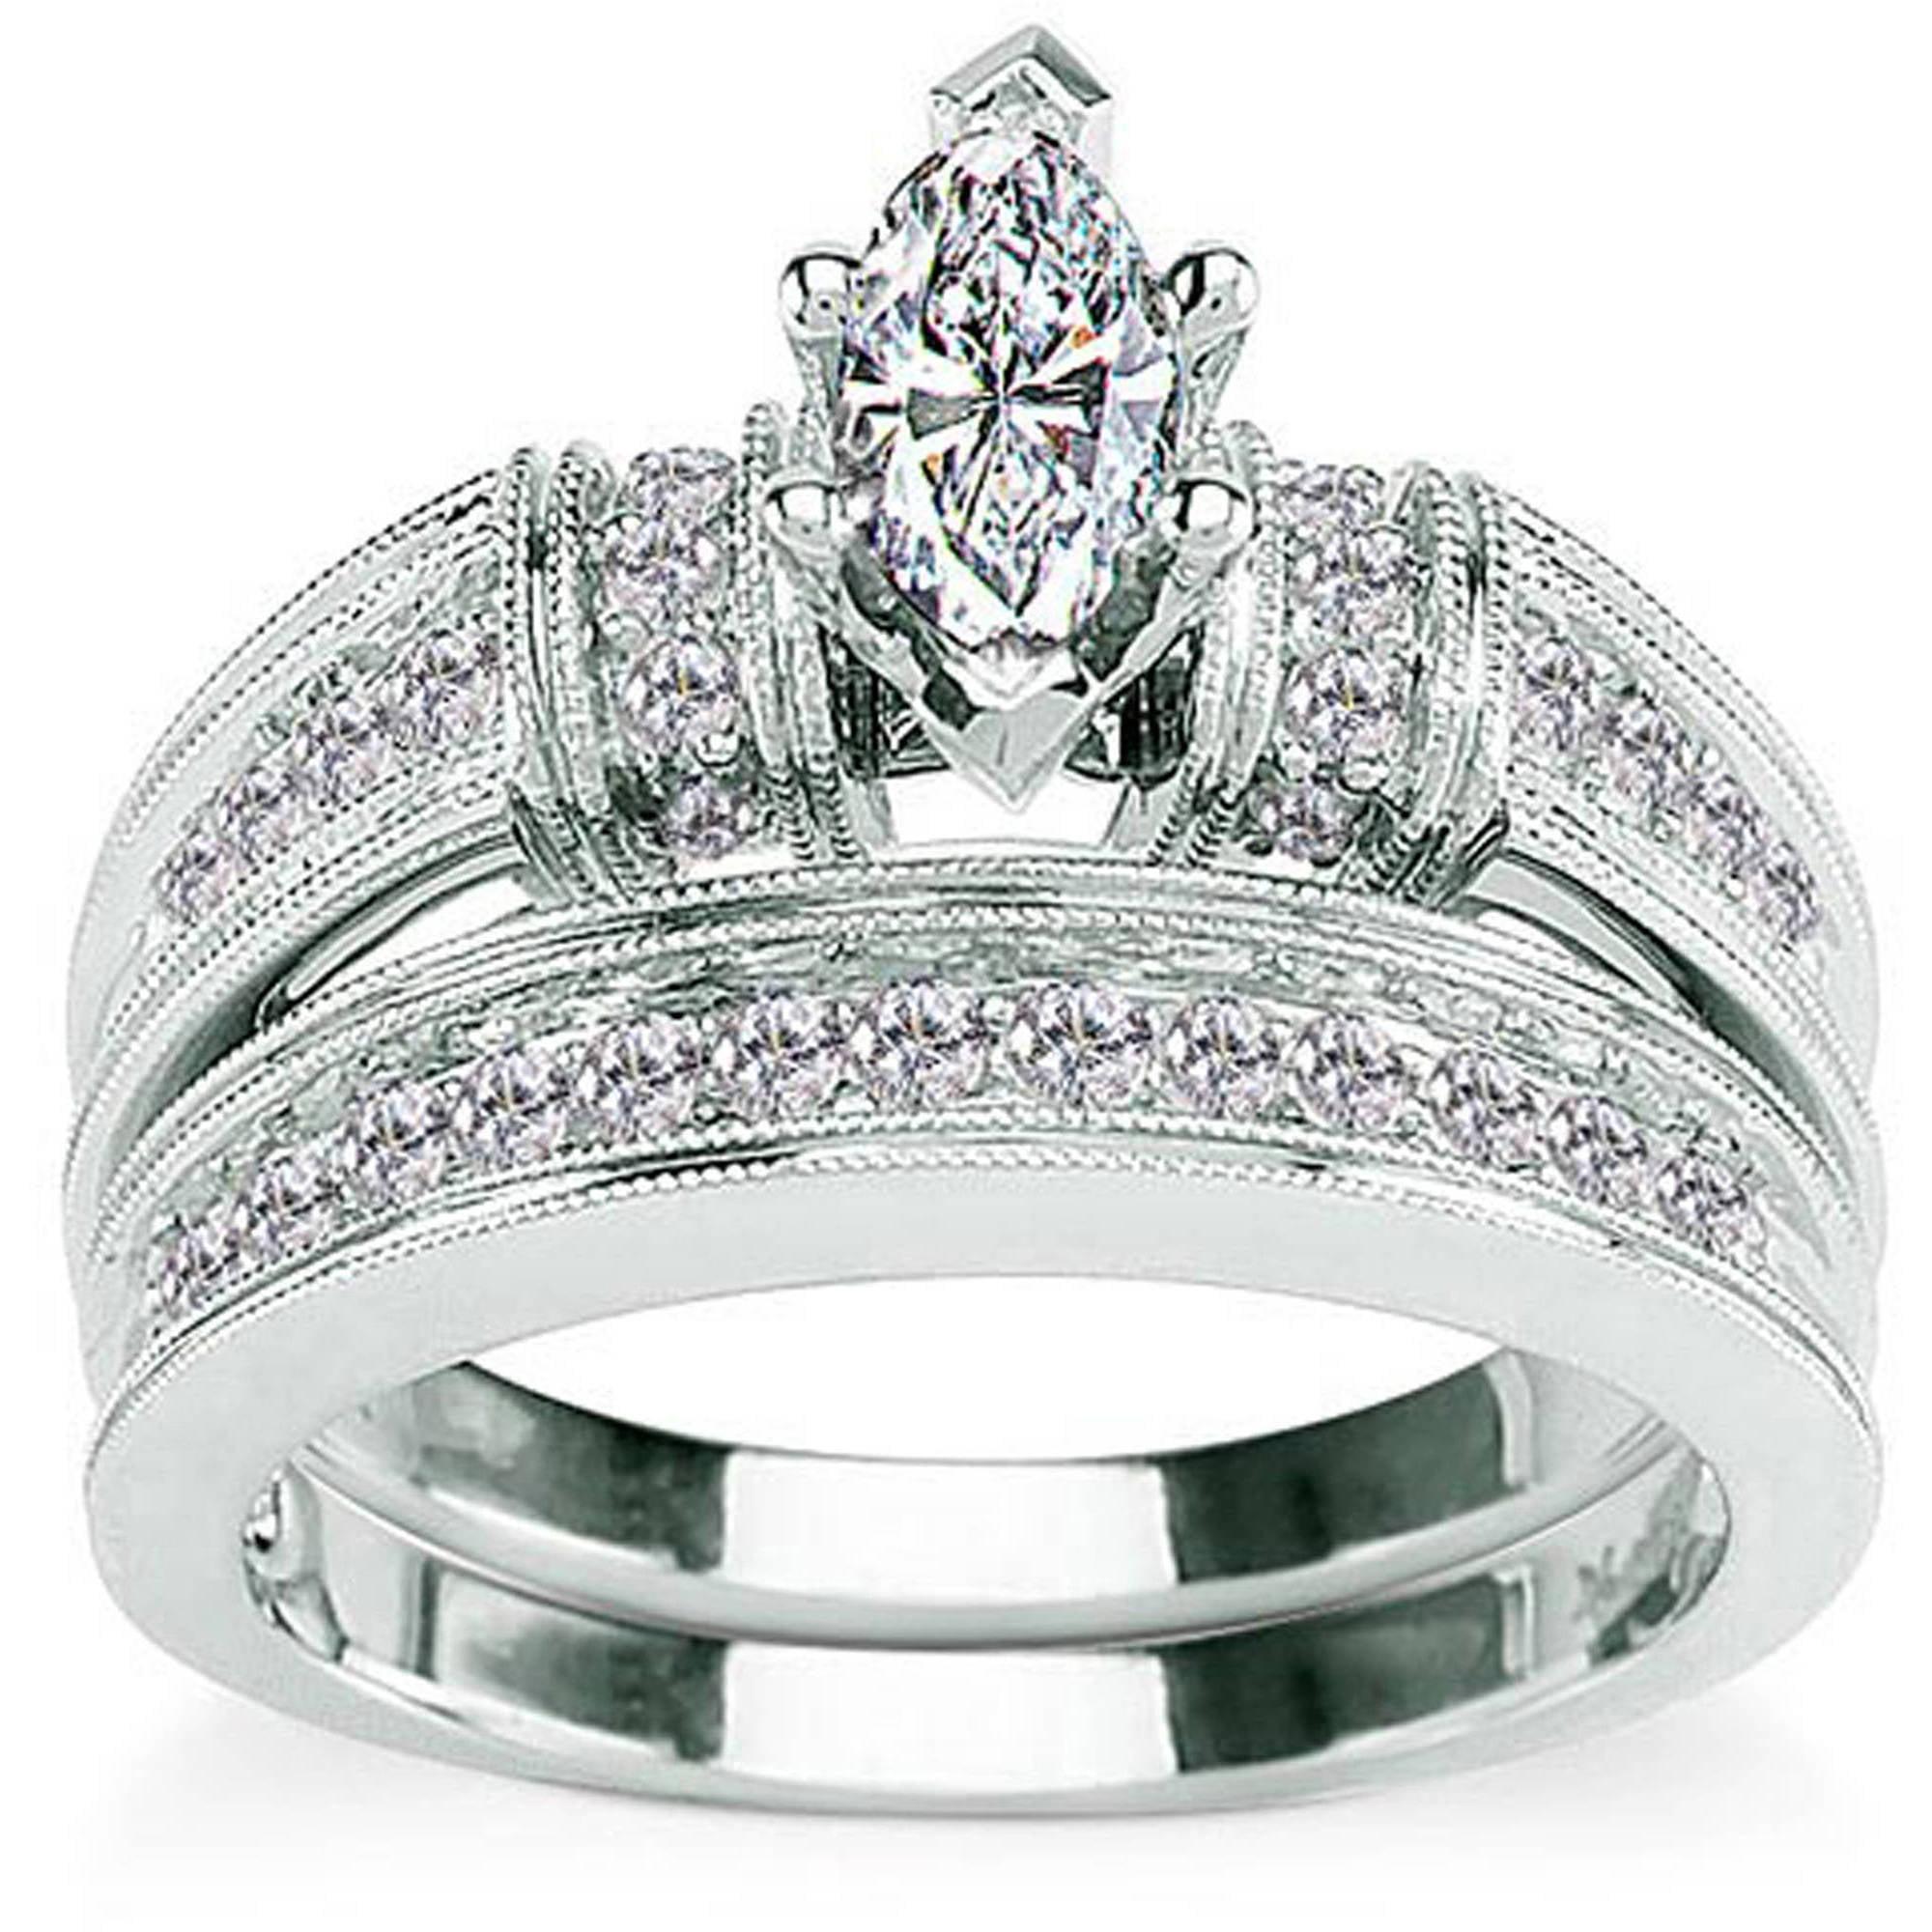 5/8 Carat Diamond Marquise 14kt Gold Bridal Set